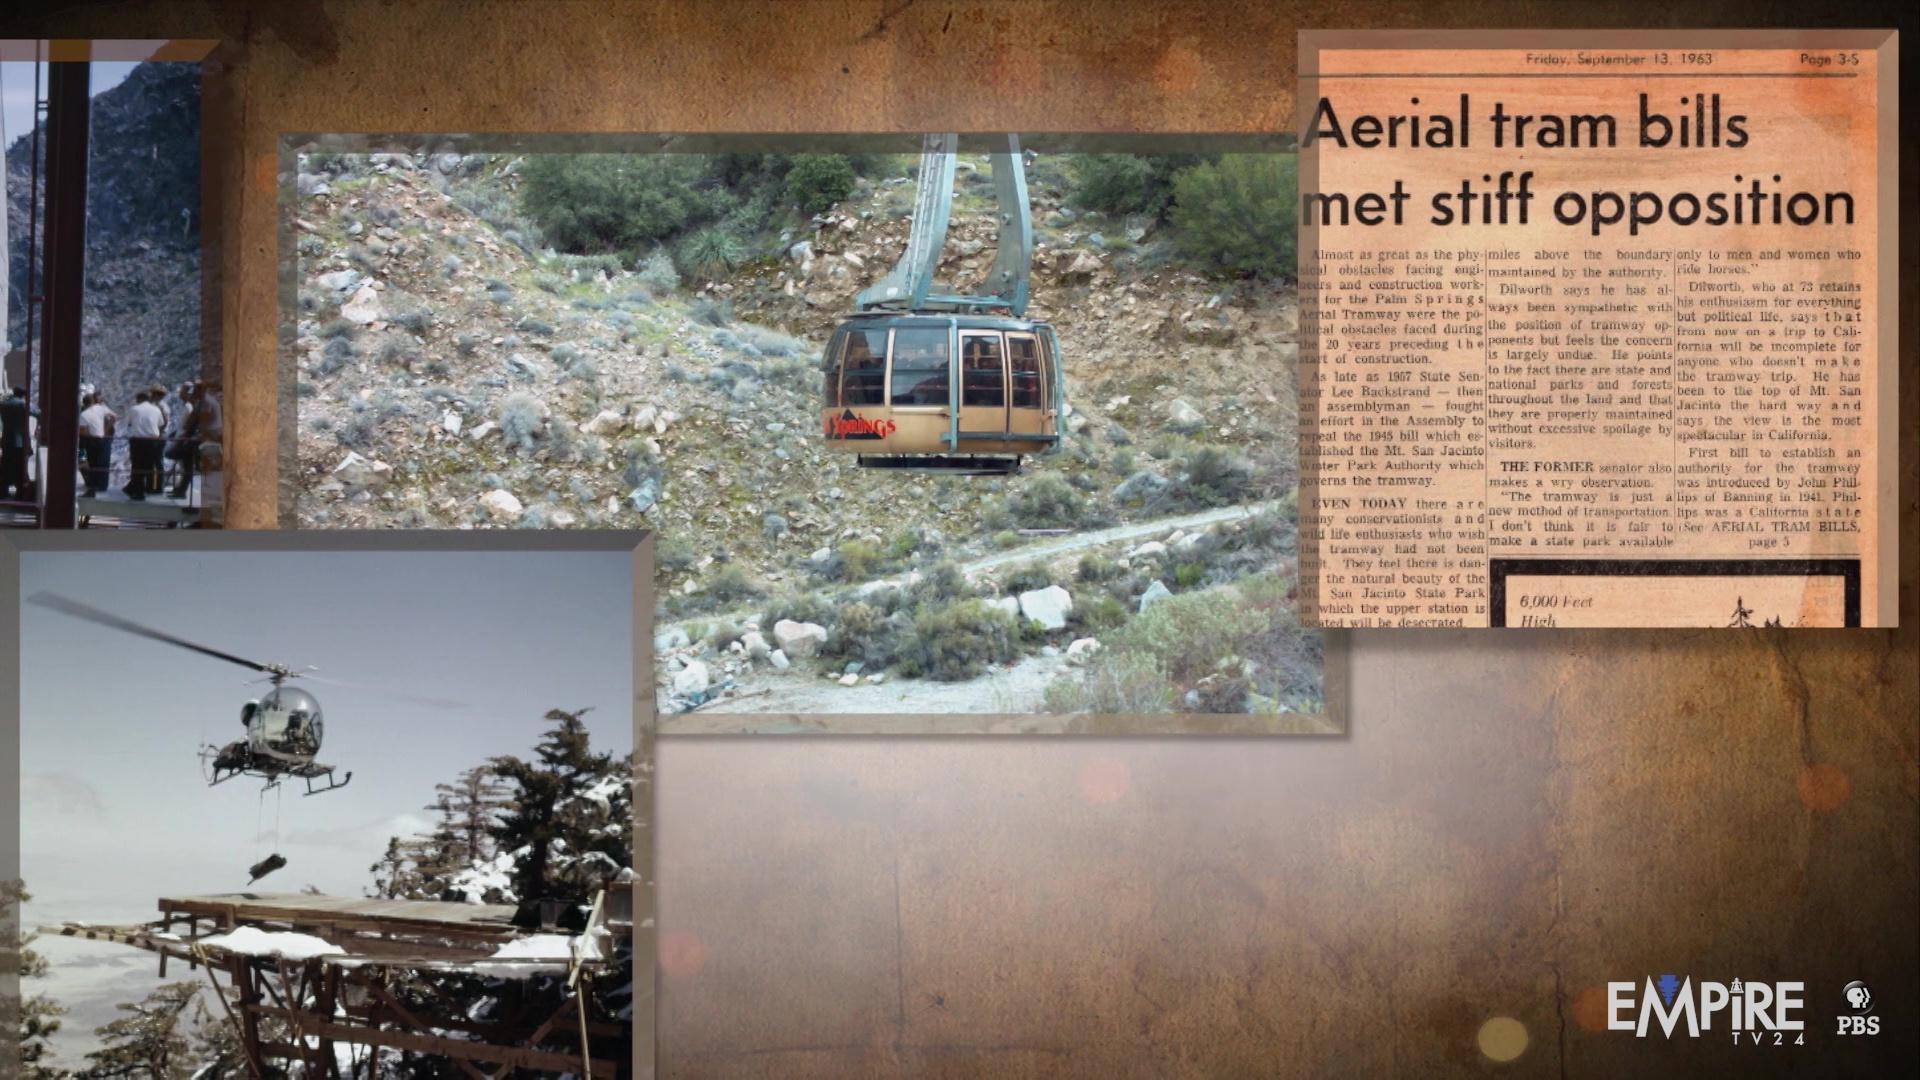 6: Palm Springs Aerial Tramway